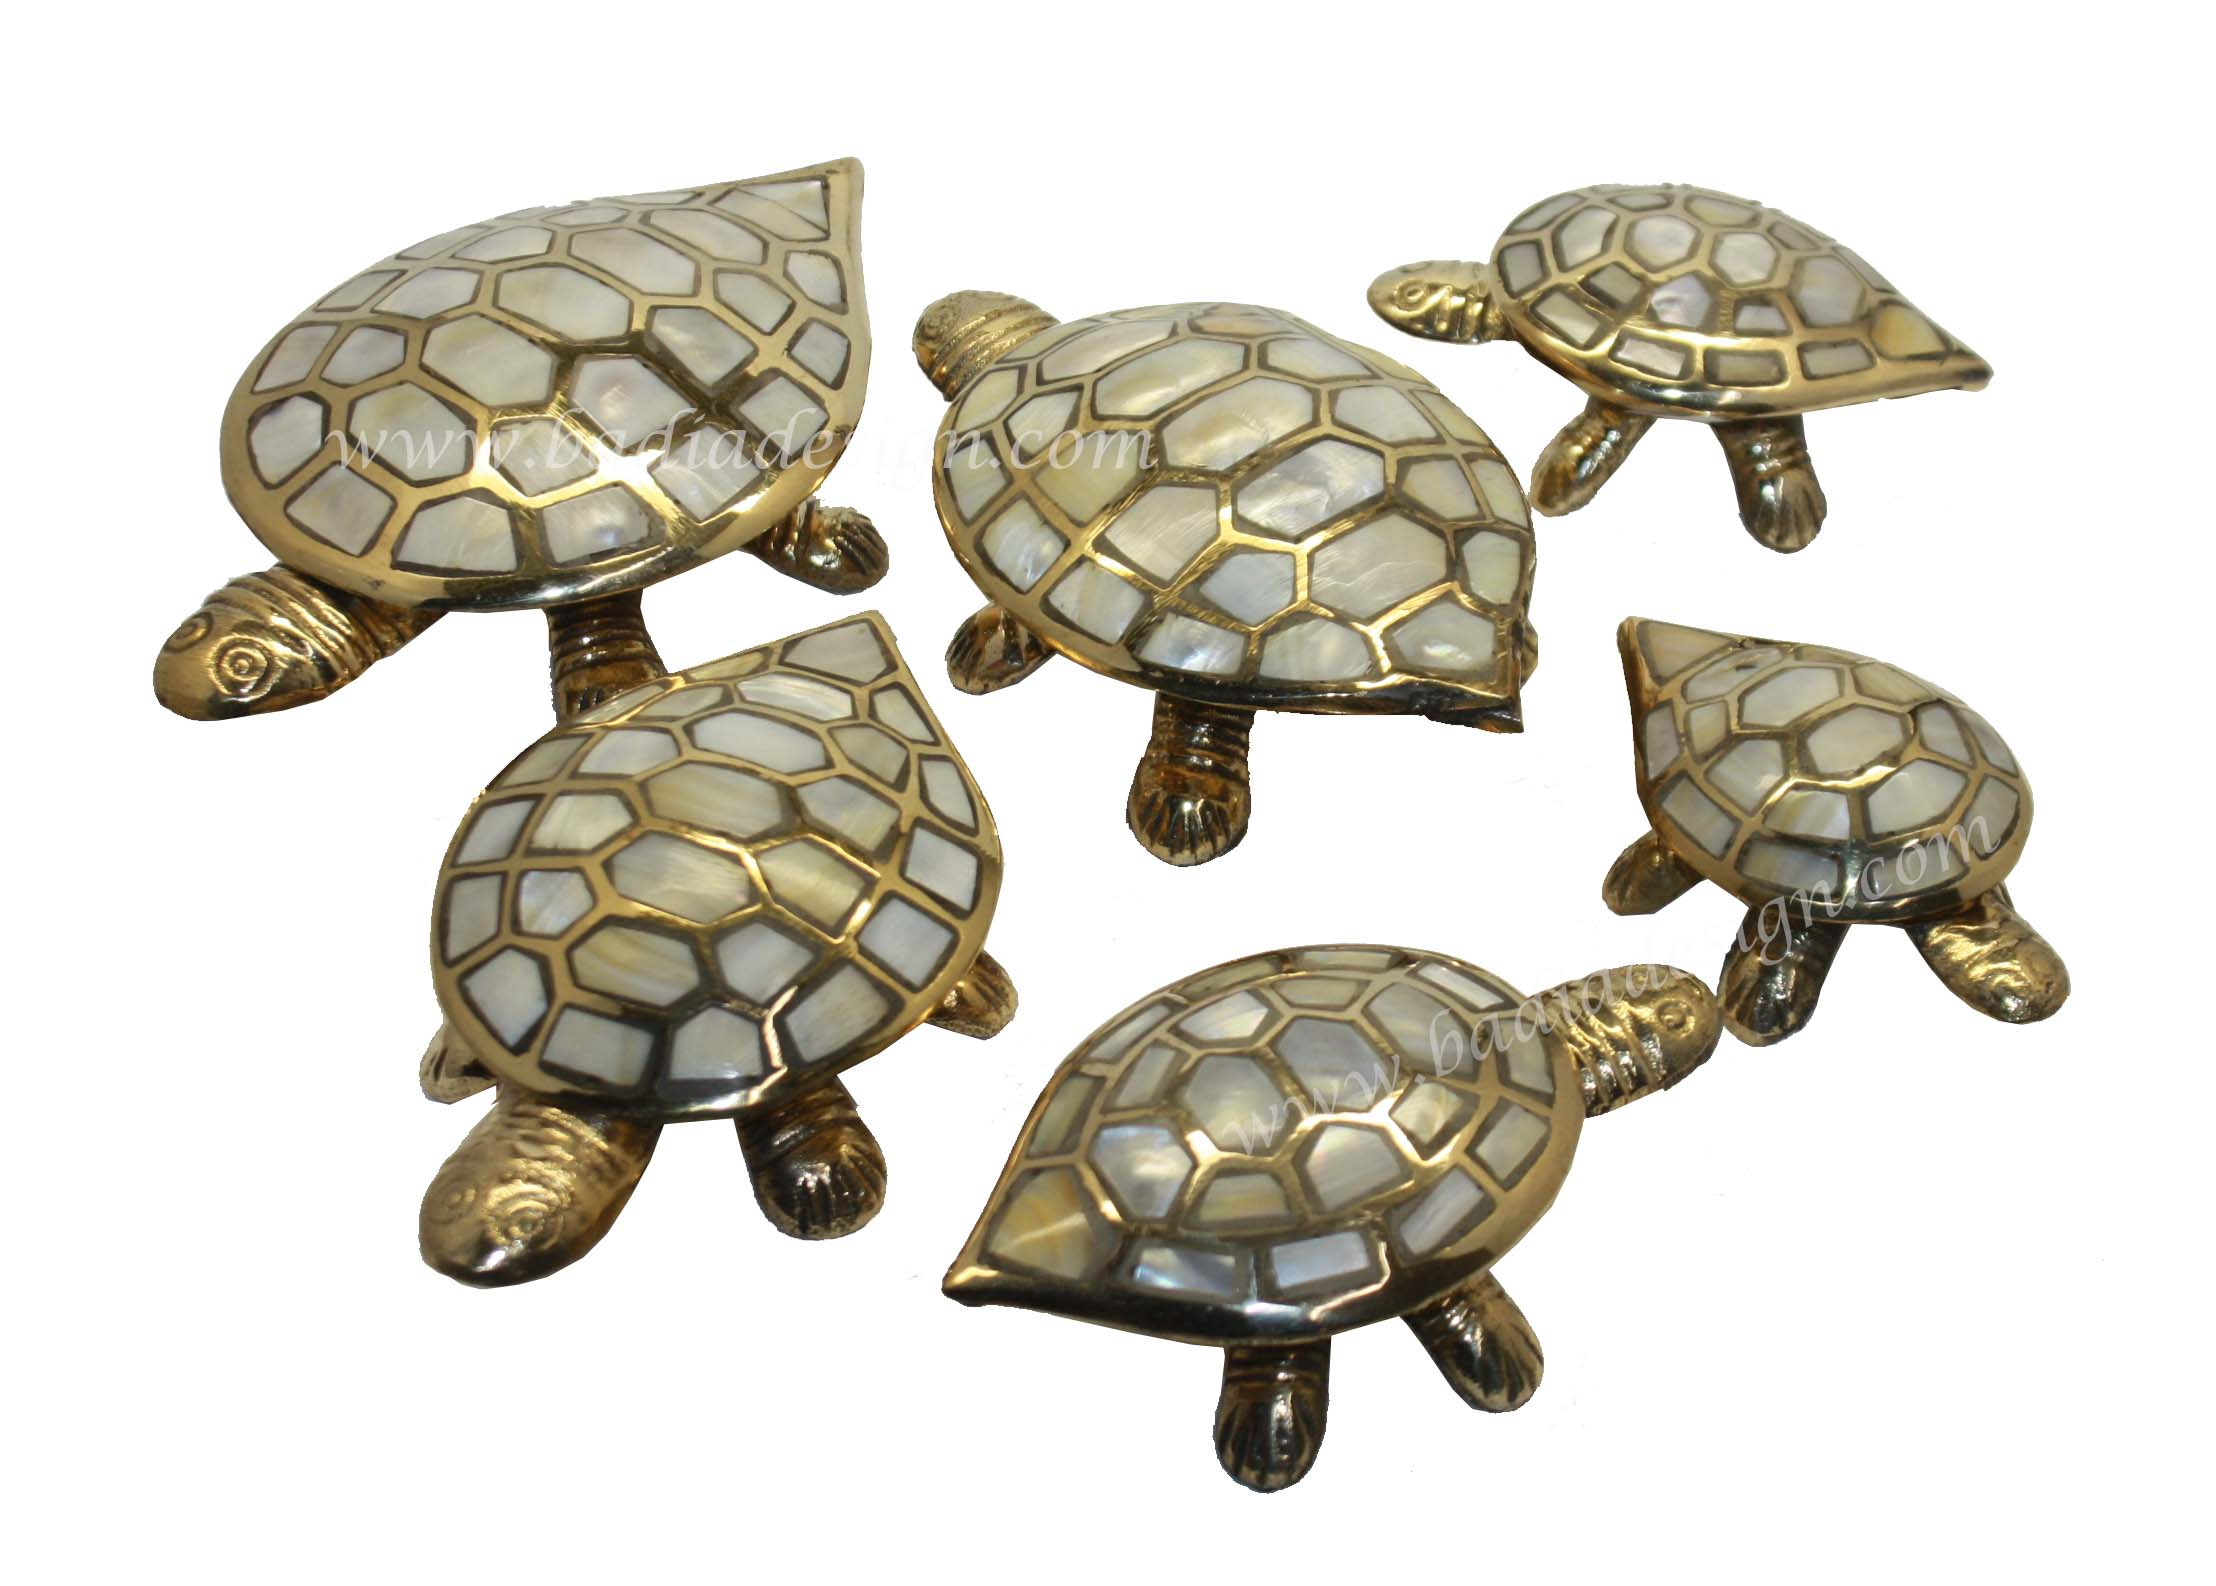 moroccan-mother-of-pearl-turtles-hd176-1.jpg